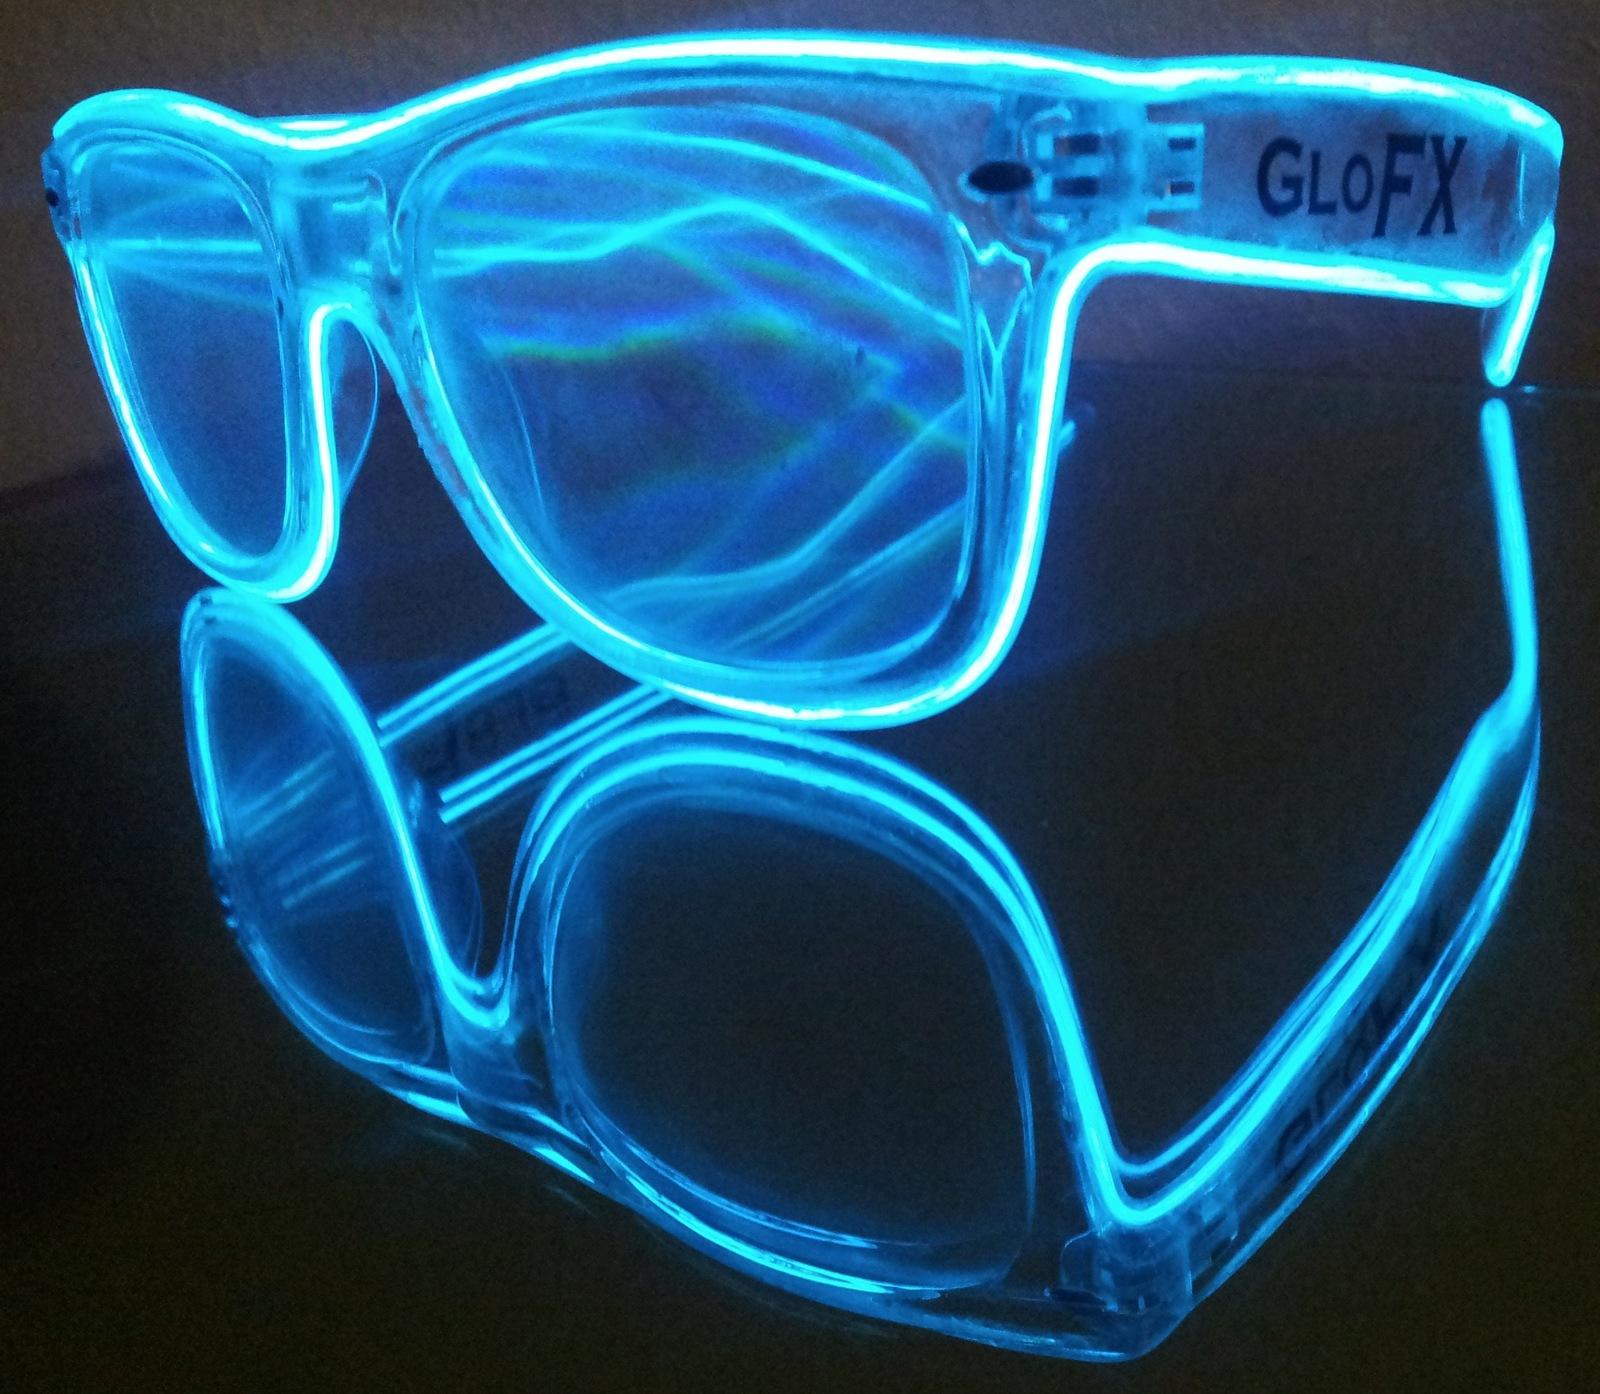 fc1381cdfca9 Insane Wild trippy rave glasses DIFFRACTION lenses rainbow crazy bright  flashing